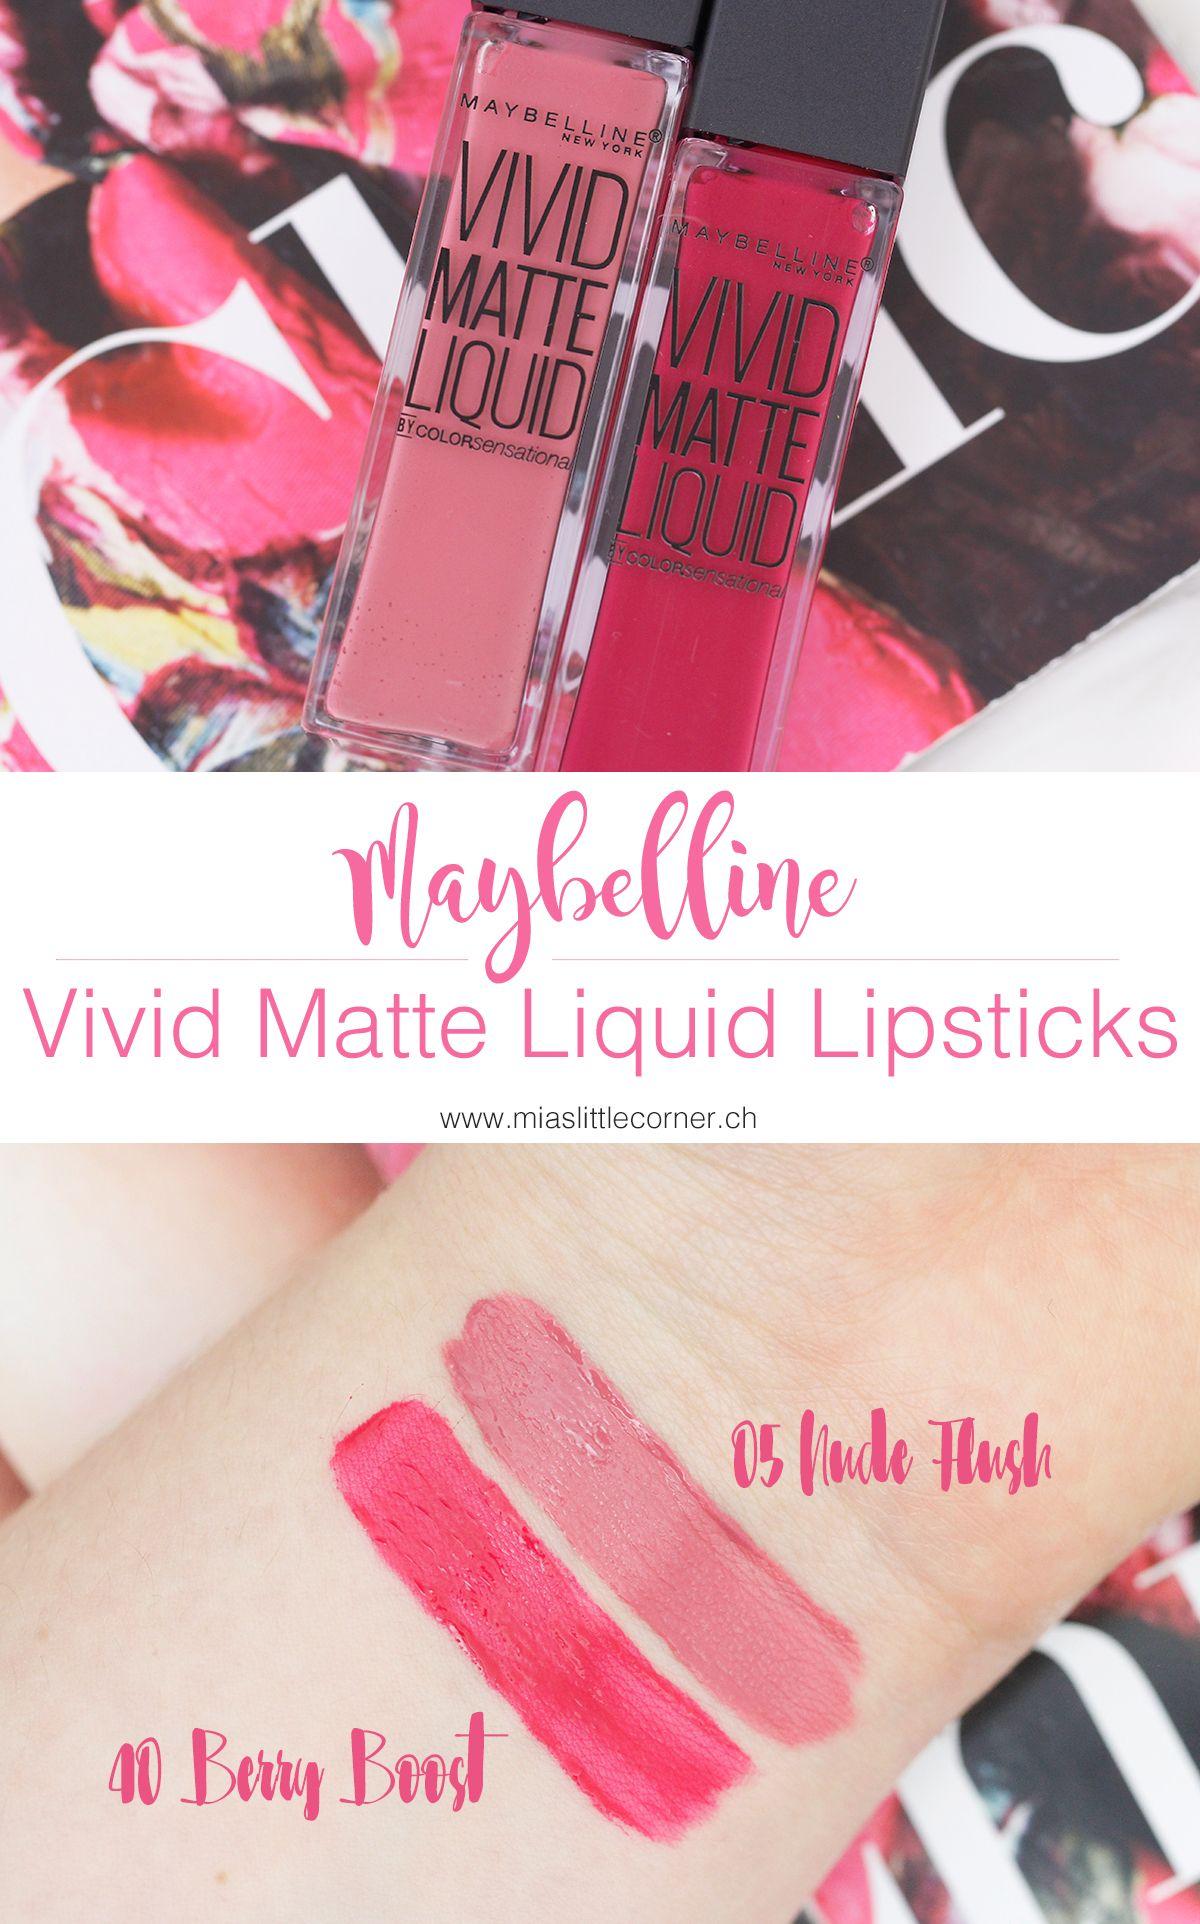 Maybelline Vivid Matte Liquid Lipsticks Vivid Matte Liquid